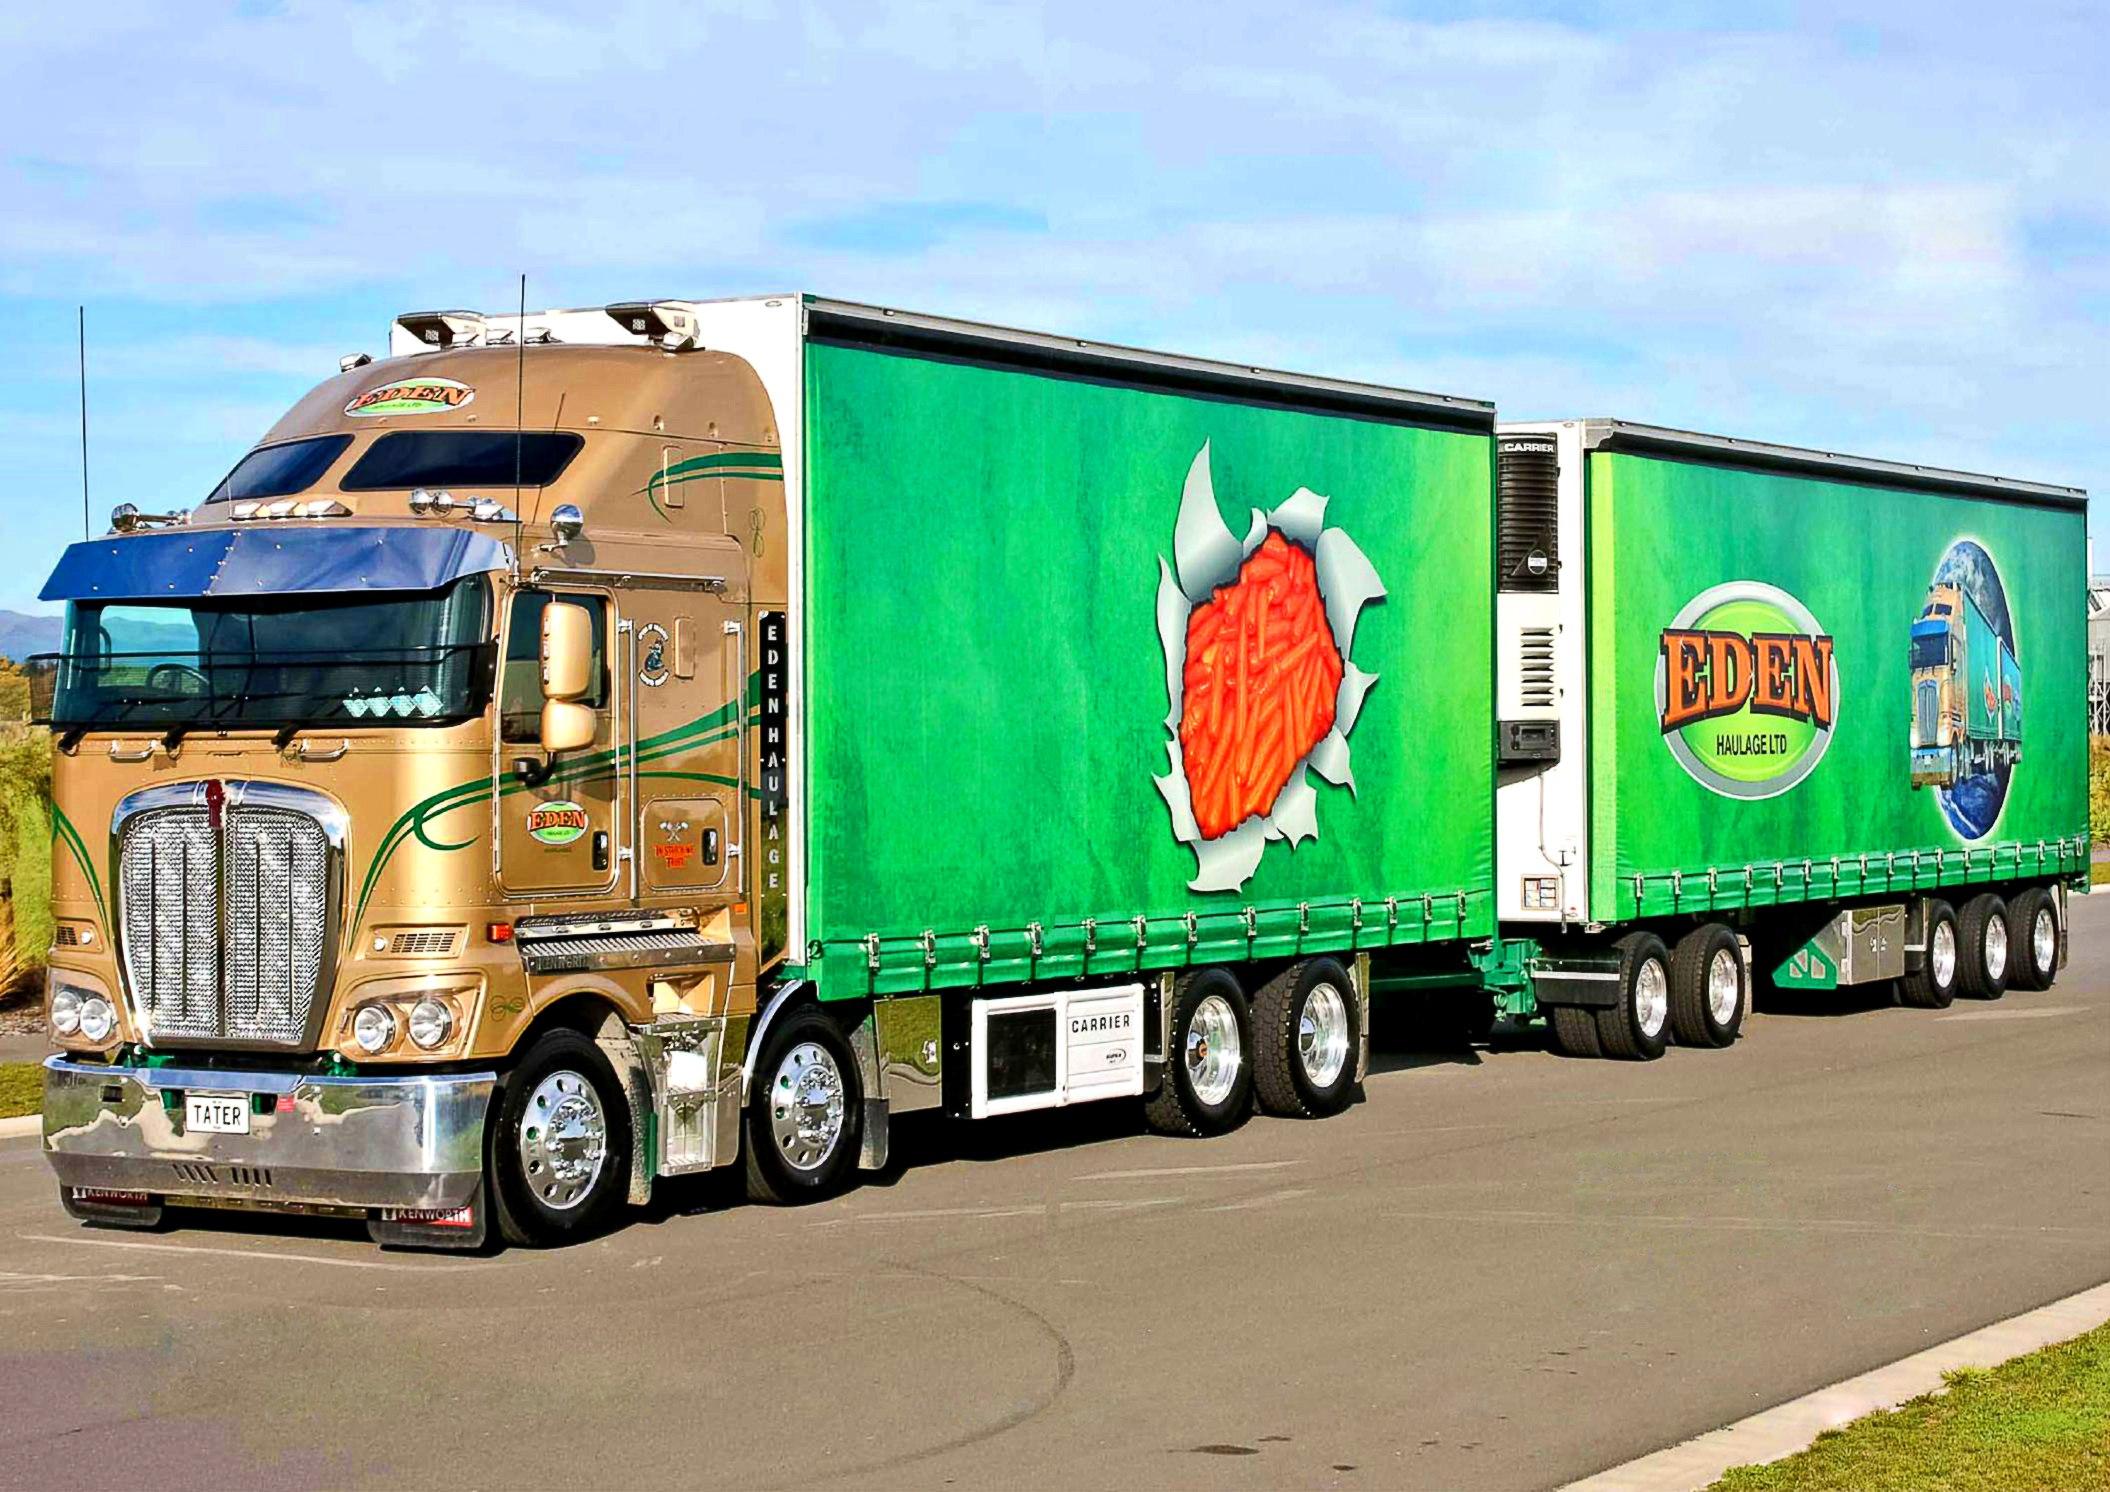 красивый юнинг грузовика 2016